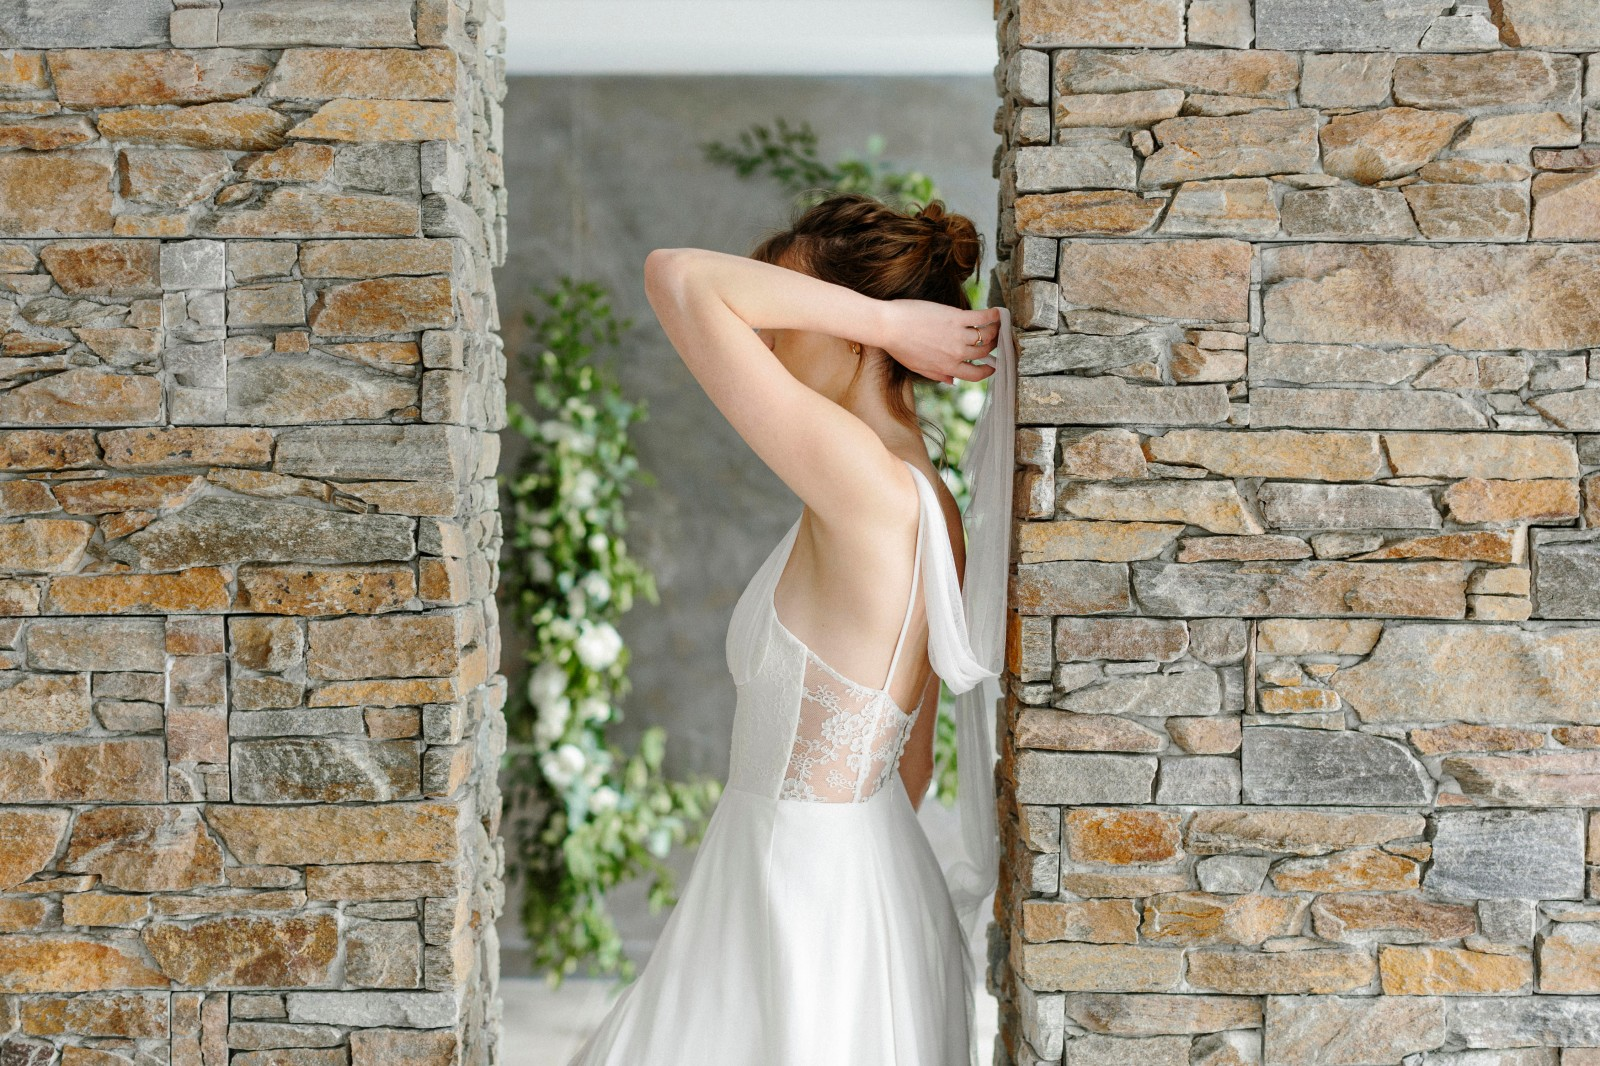 robe de mariée en tencel et dentelle de calais.